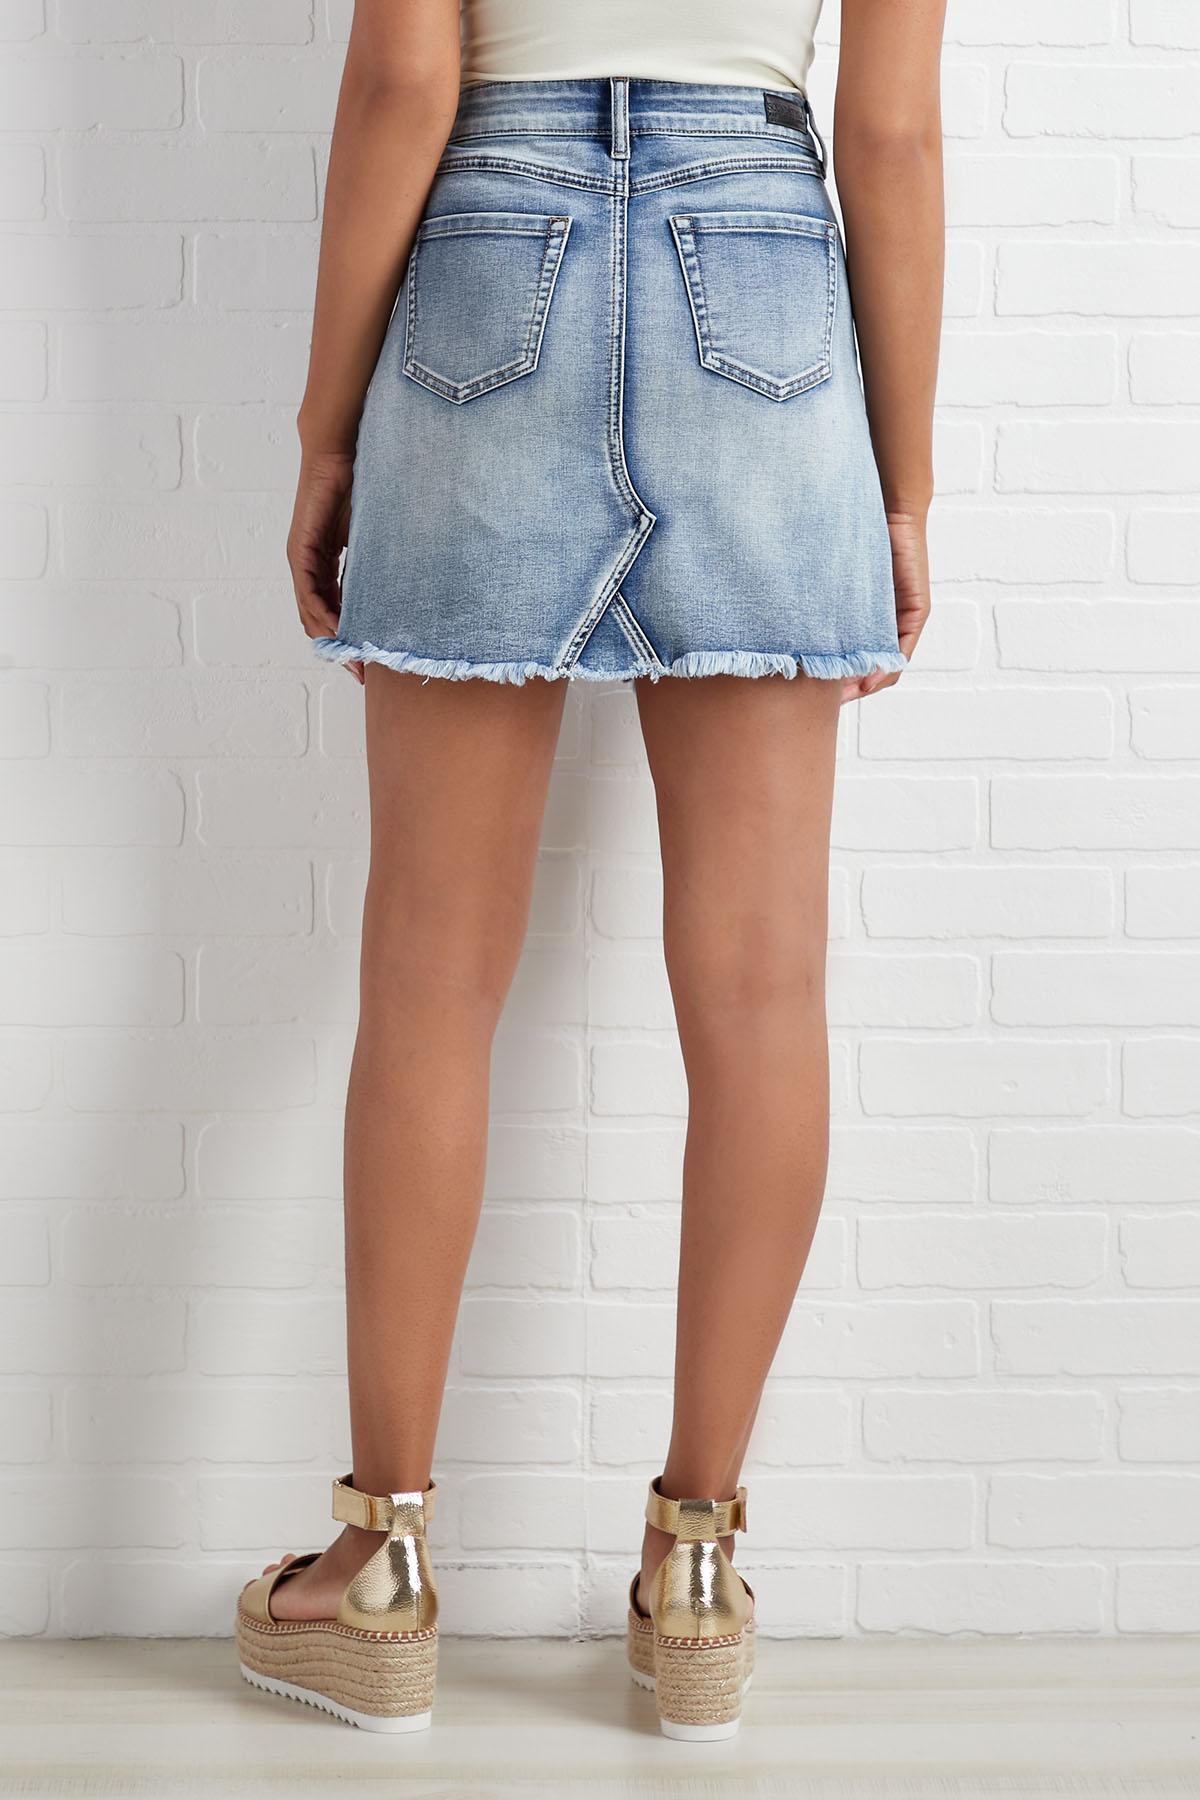 A Little Distressed Skirt